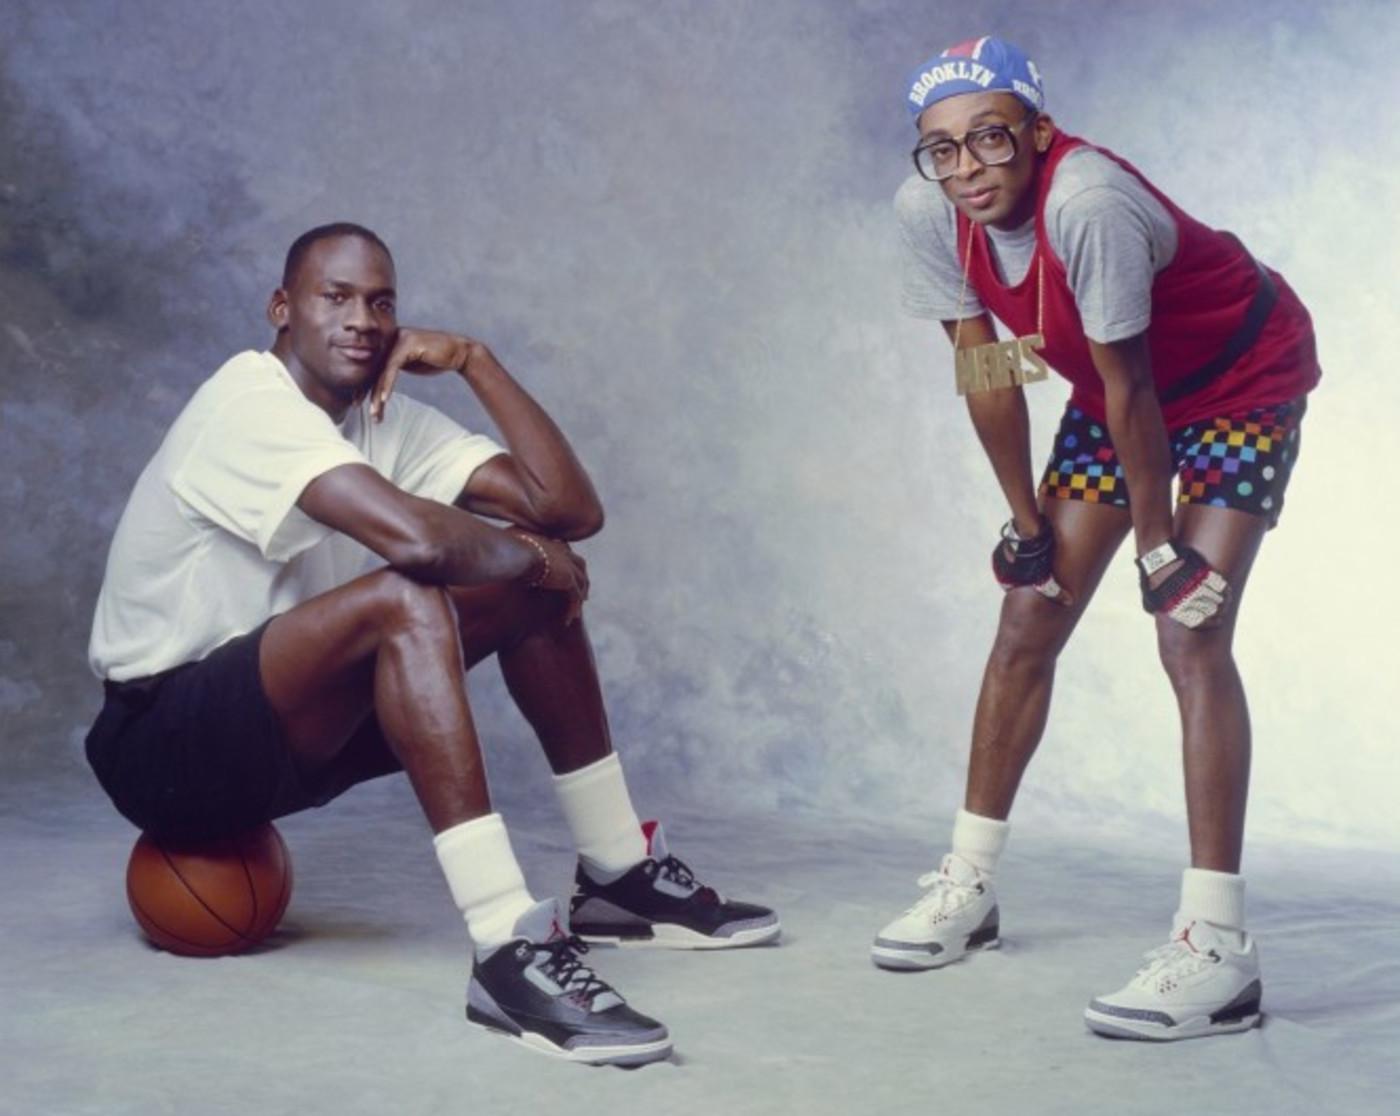 Michael Jordan and Mars Blackmon